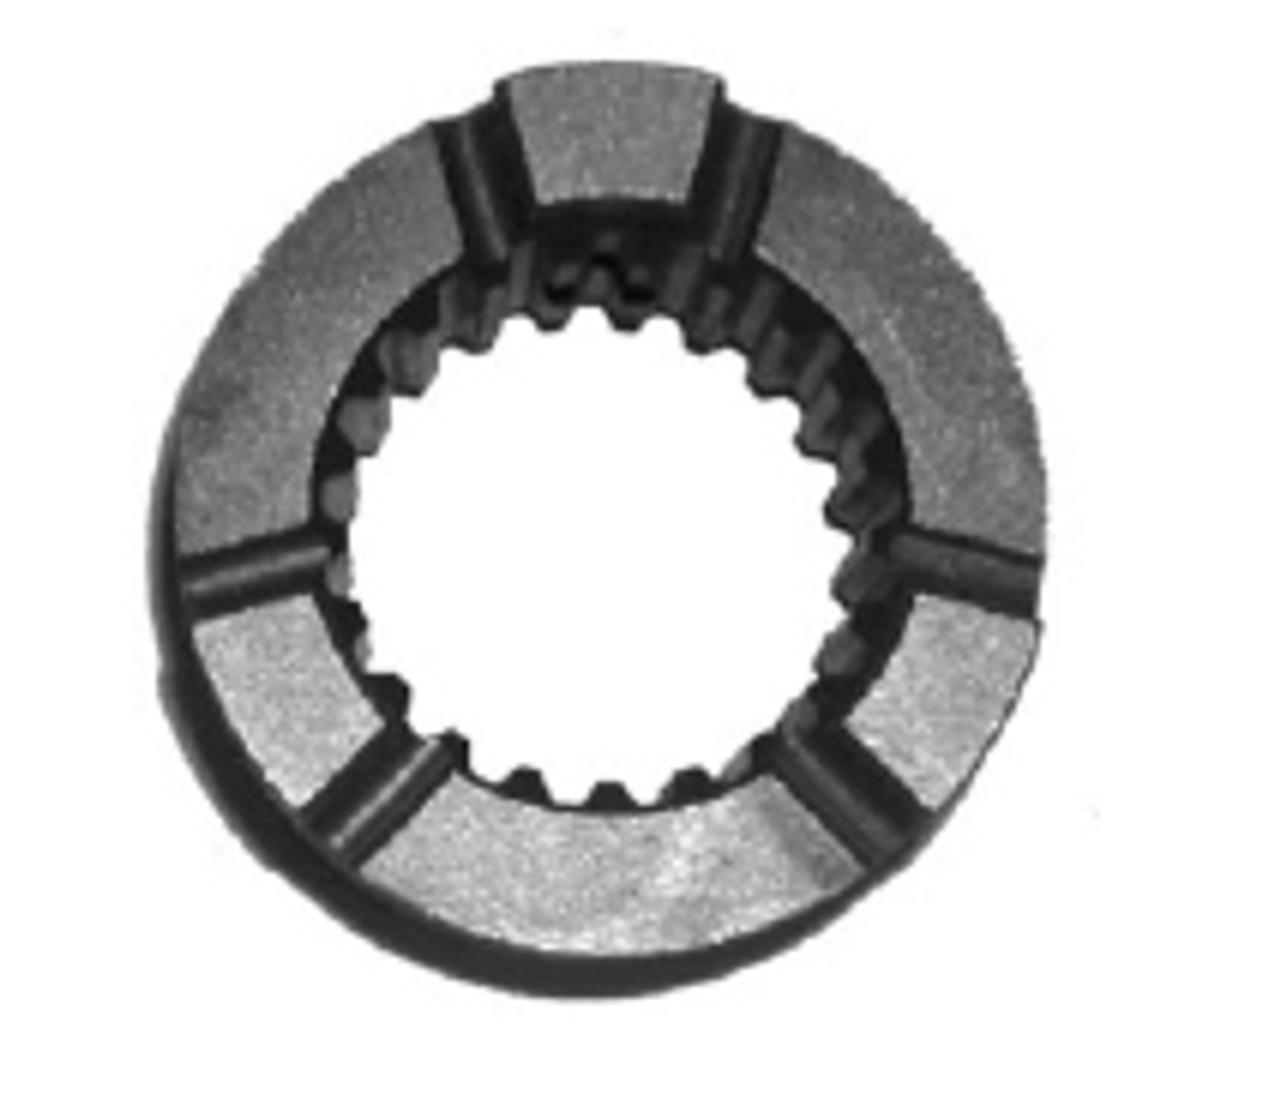 New EMP Mercury/Mariner/Force 3-Dog Reverse Clutch Dog [Replaces OEM 52-822539T]